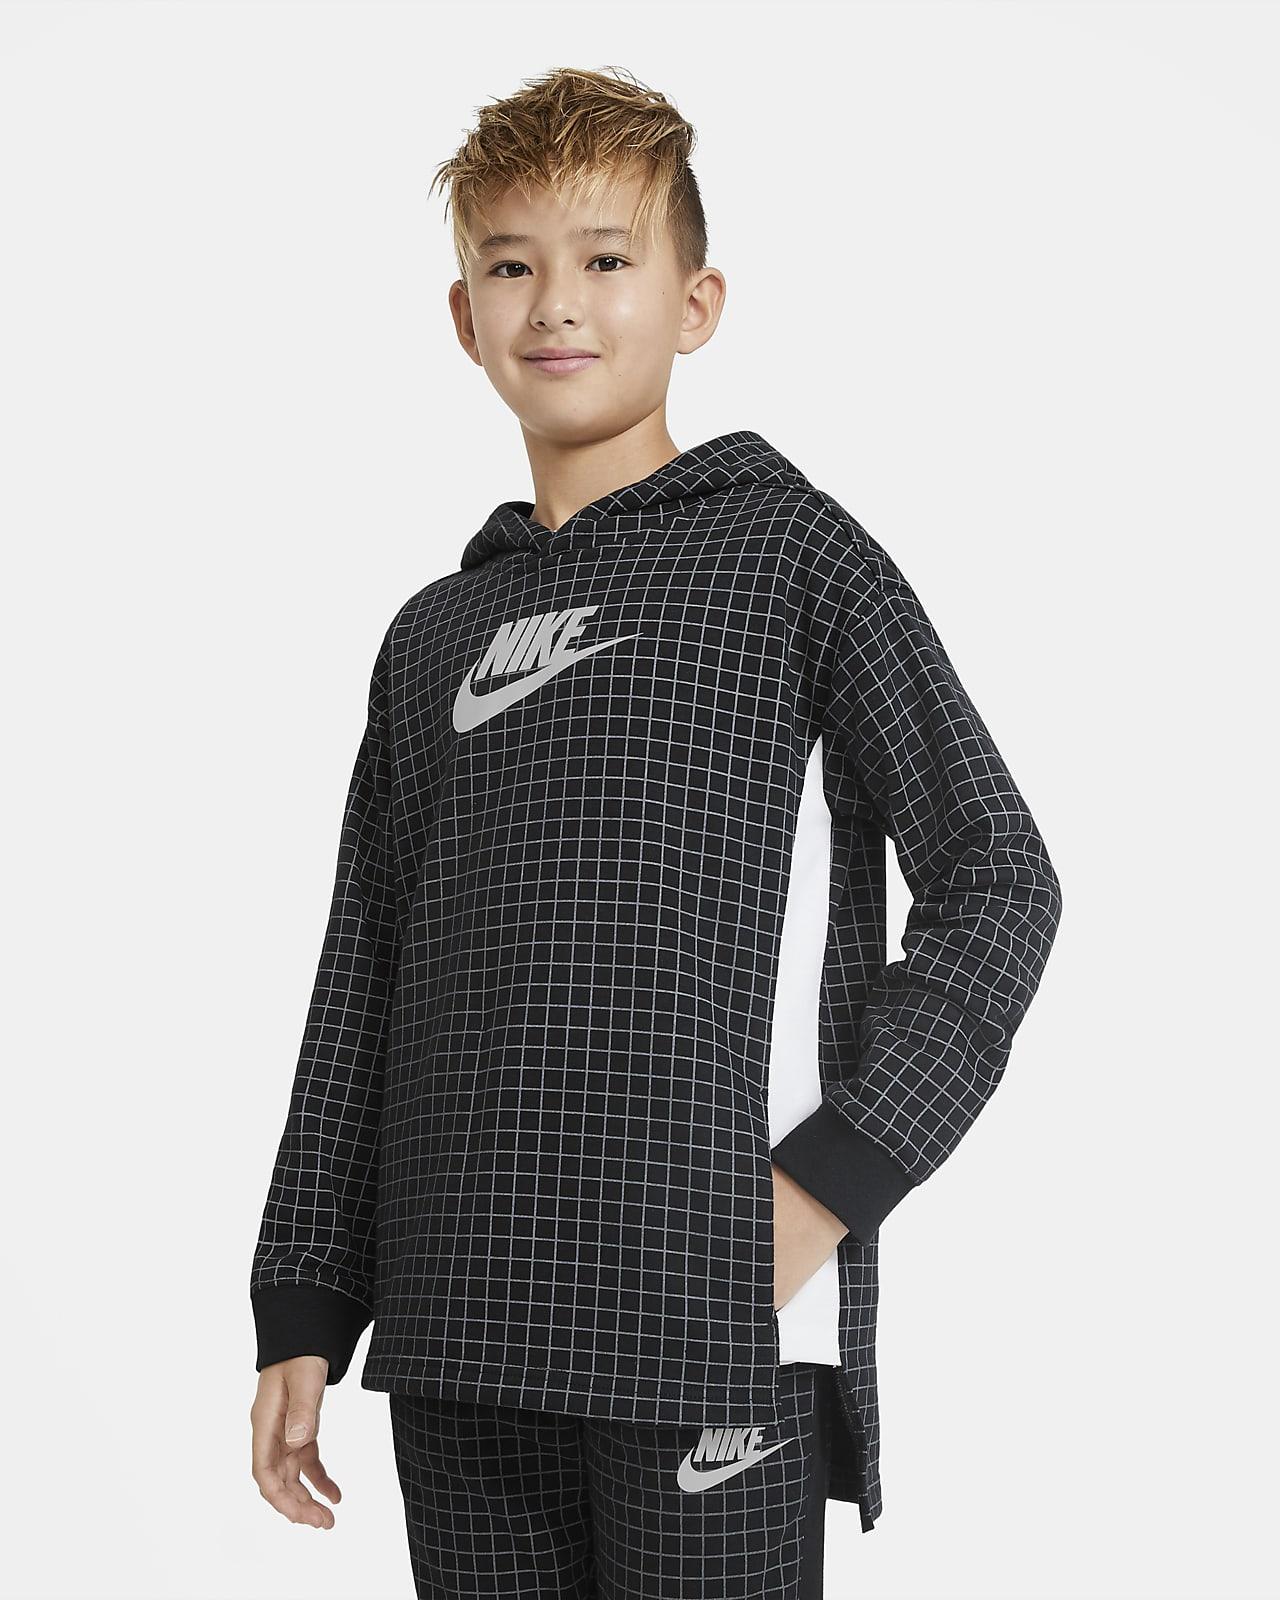 Haut en tissu Fleece Nike Sportswear pour Garçon plus âgé